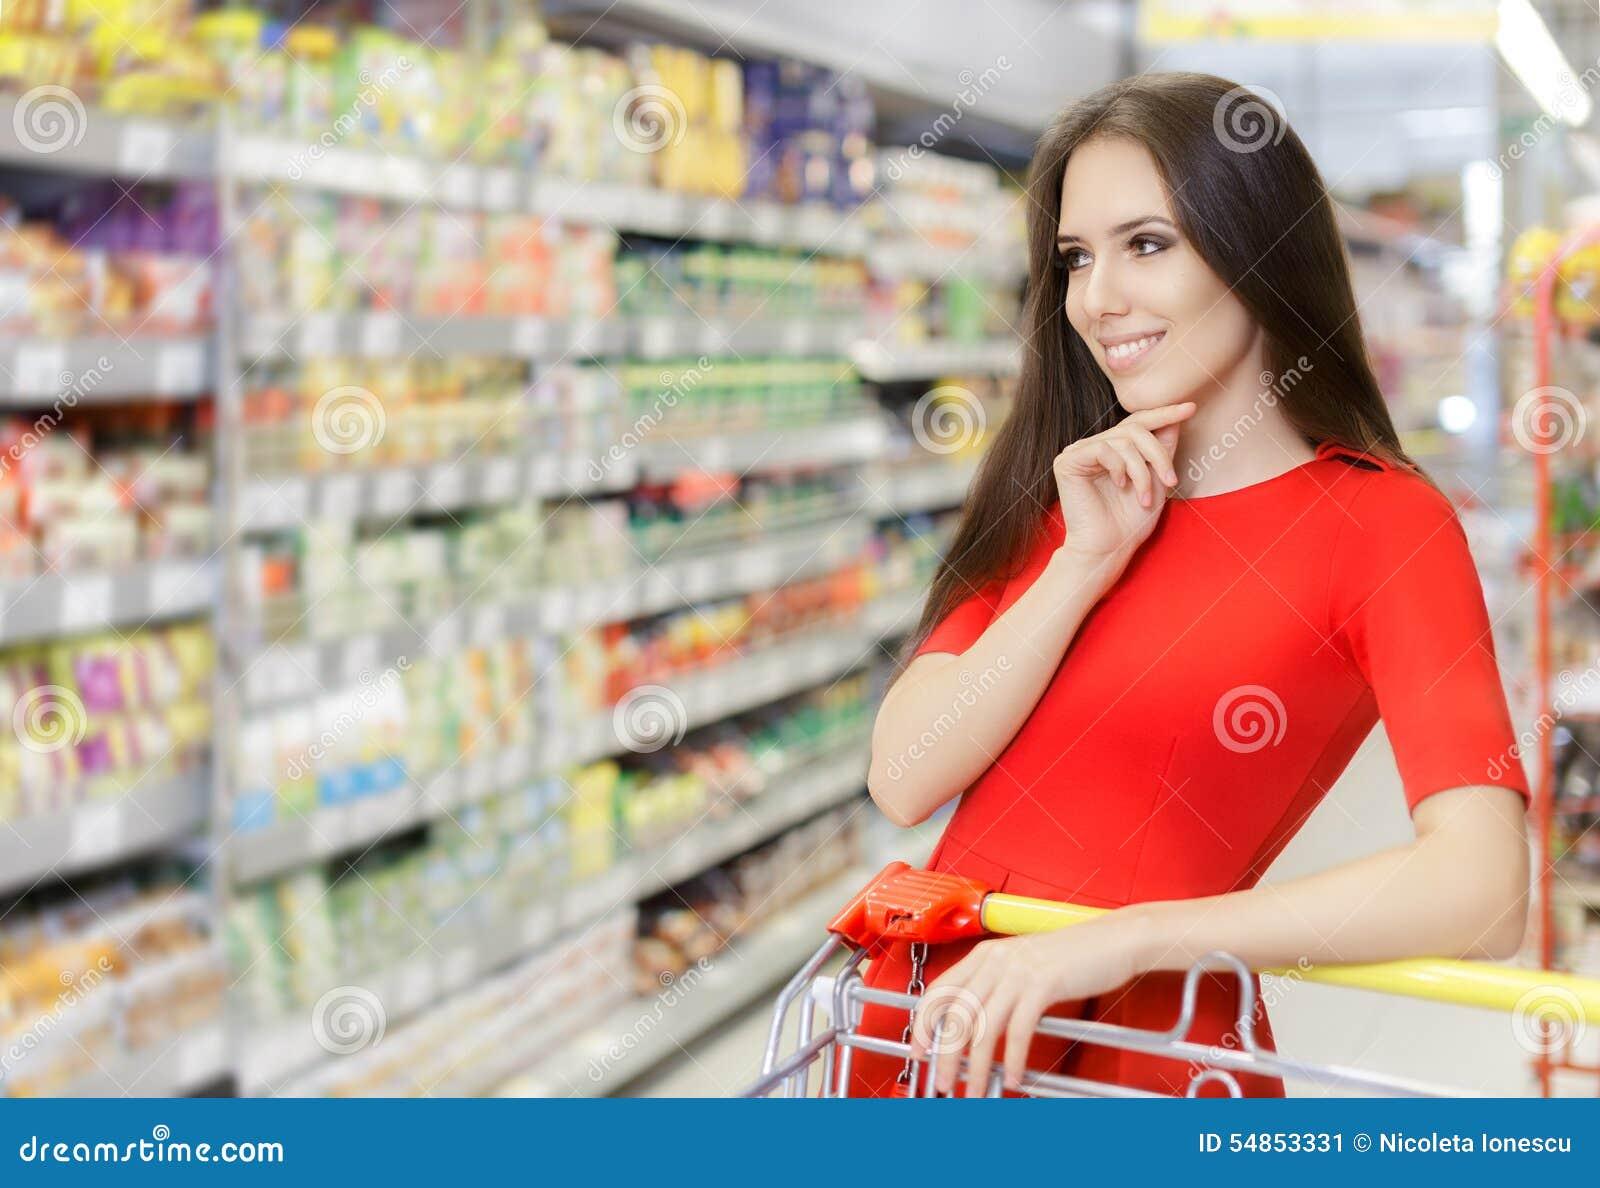 buy low beauty supply